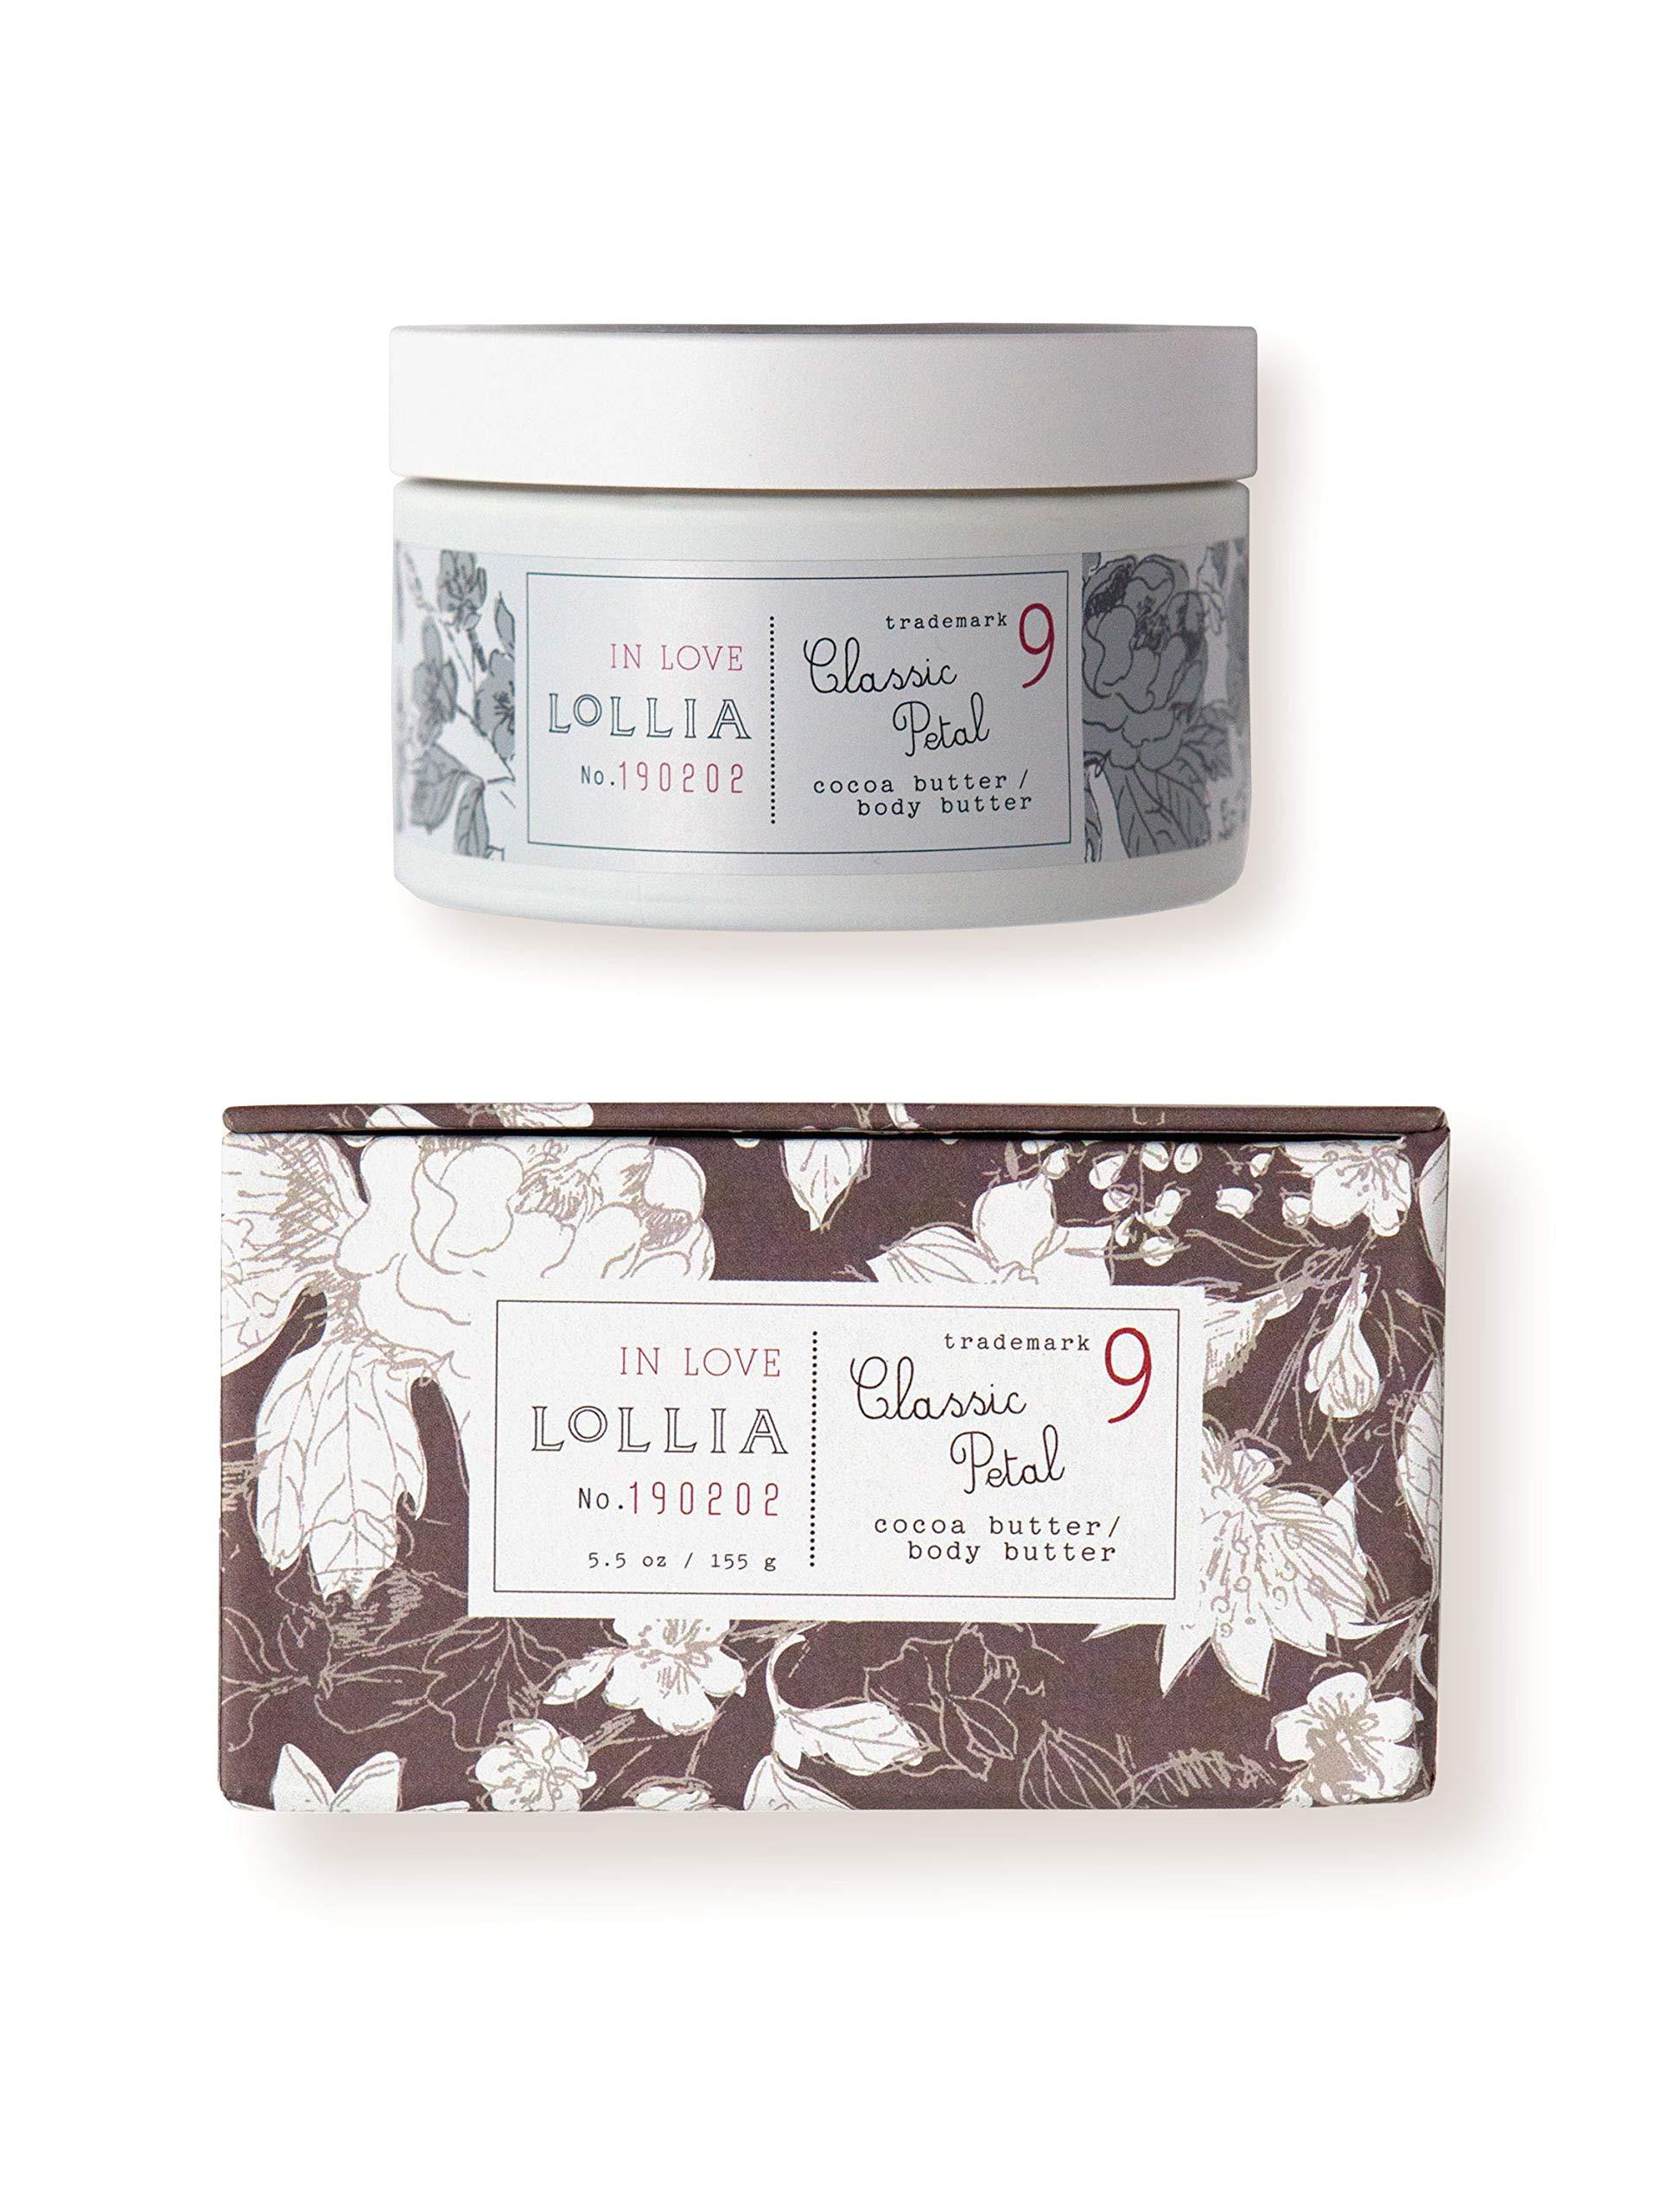 lollia in love whipped body butter margot elena s classic petal body cream 5 5 oz